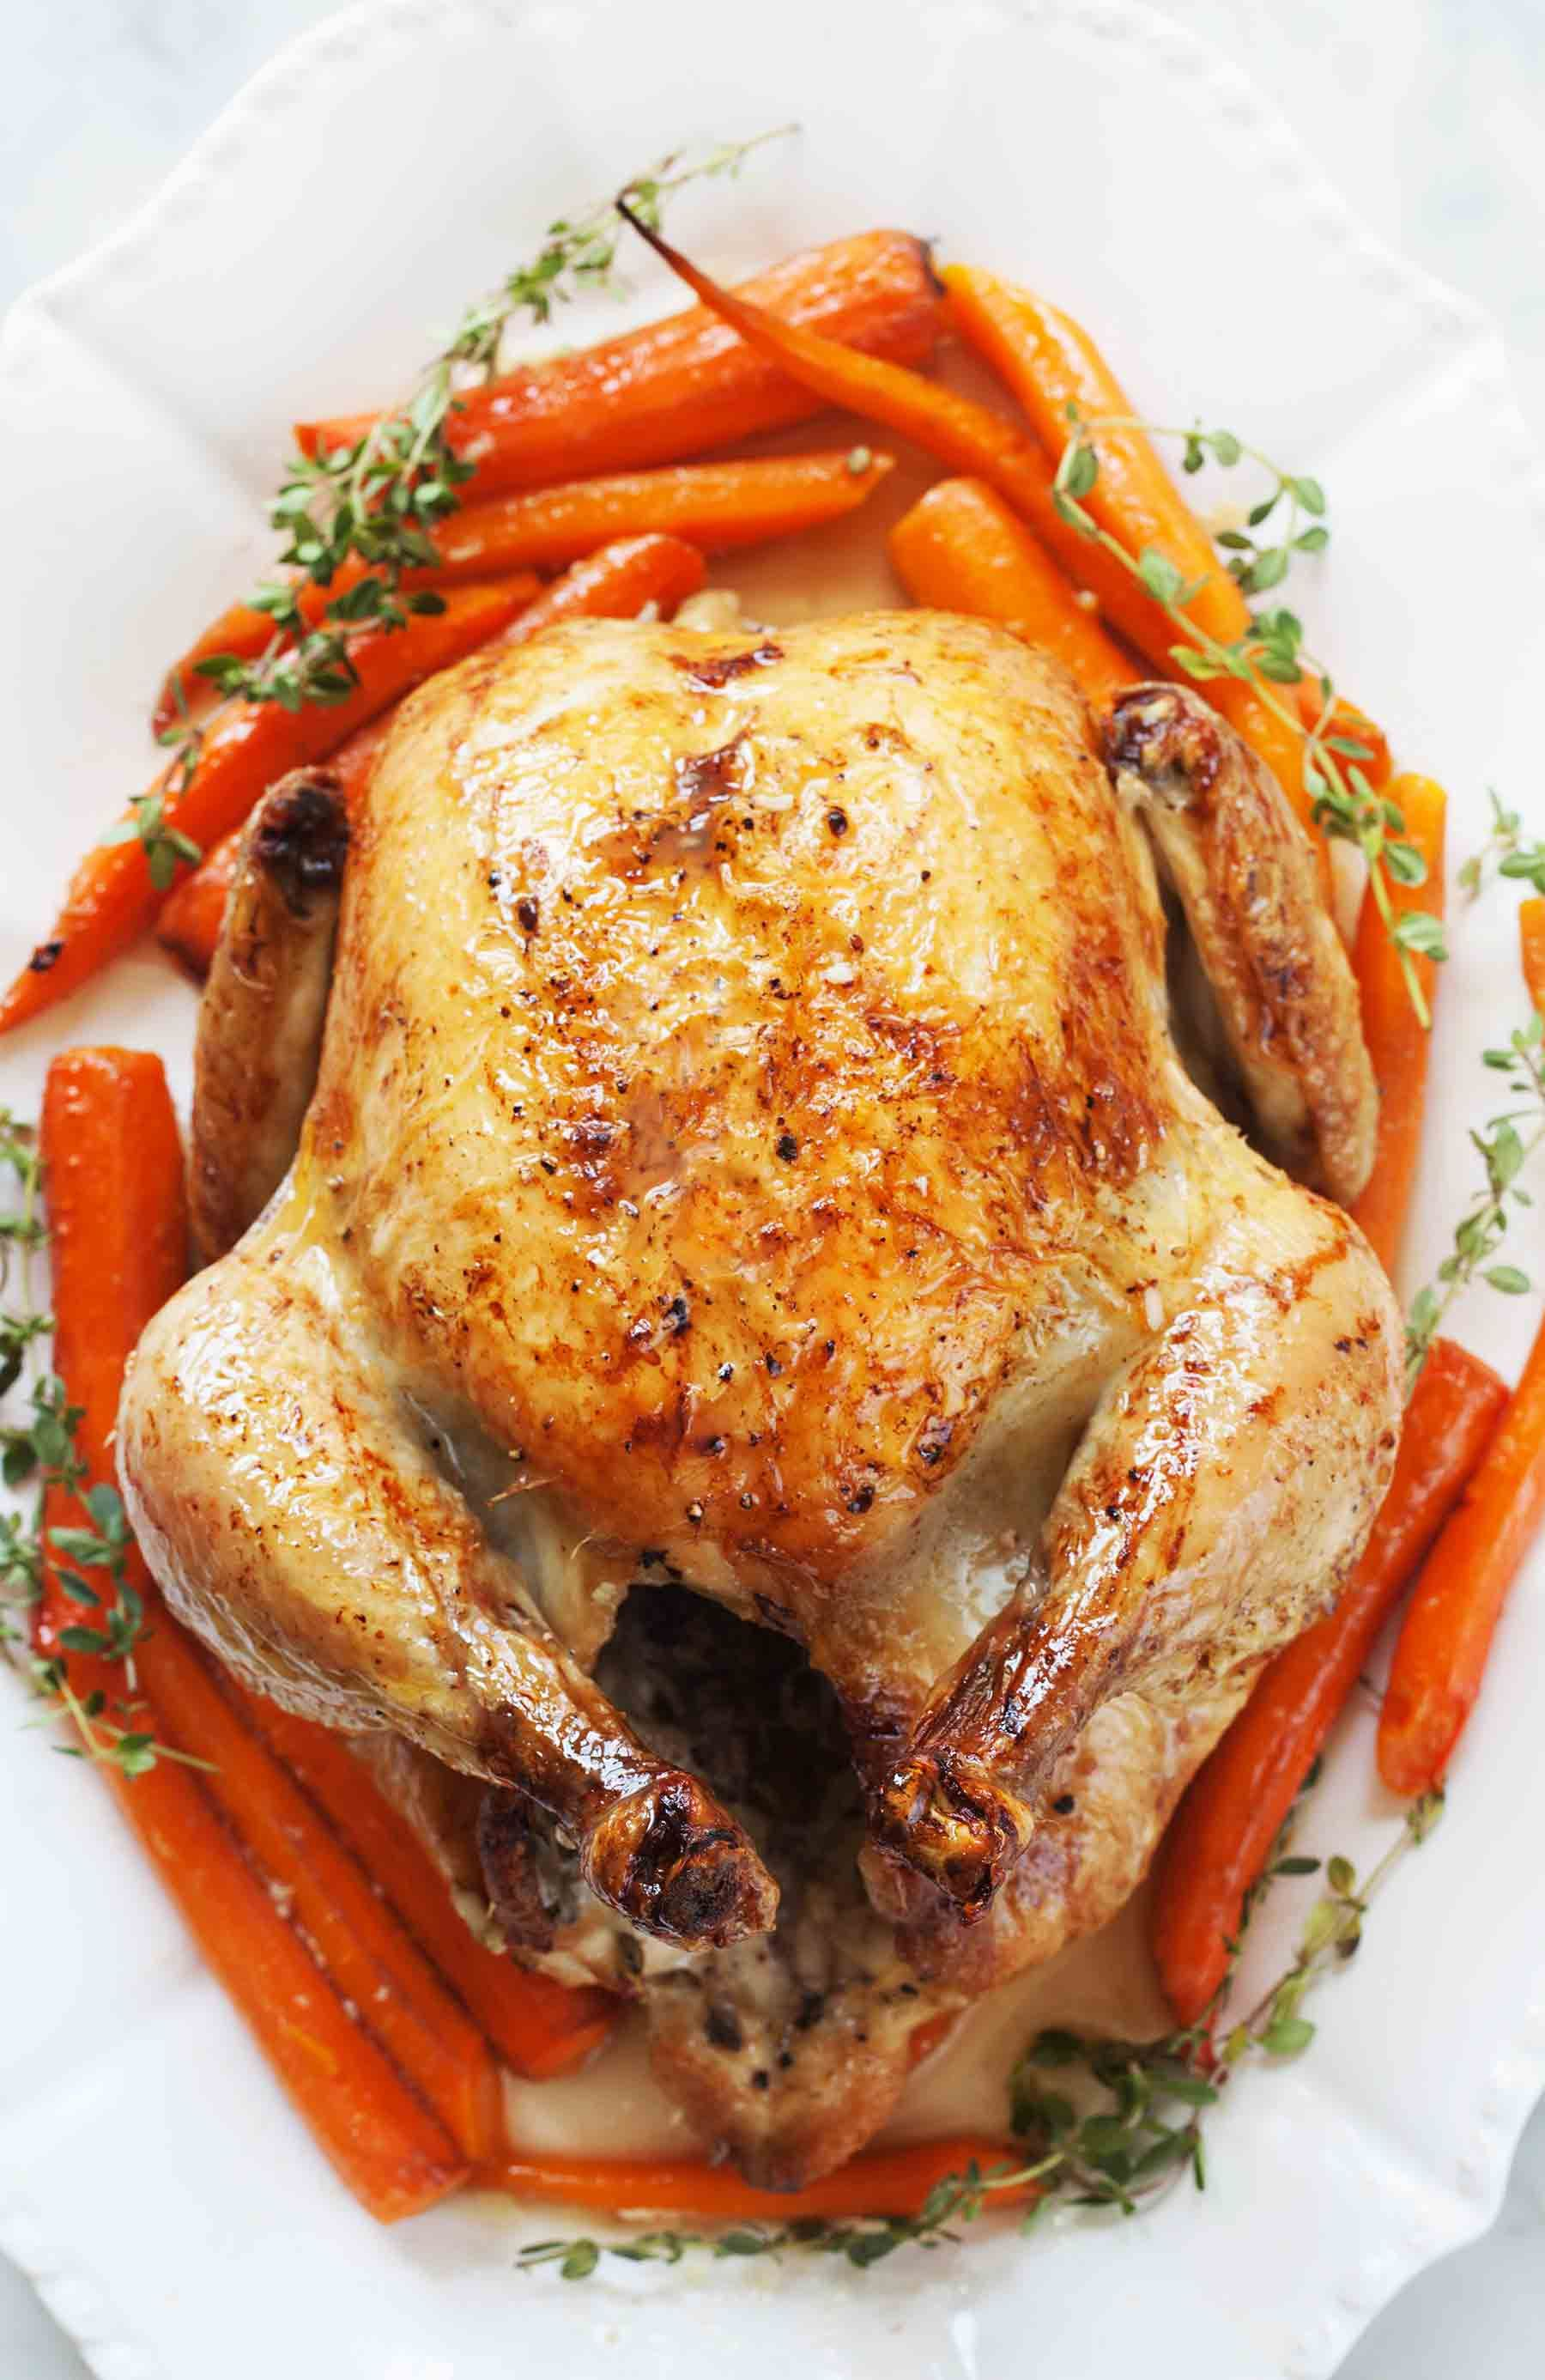 Roast Chicken With Carrots Recipe Simplyrecipes Com Recipe Stuffed Whole Chicken Whole Roasted Chicken Recipes